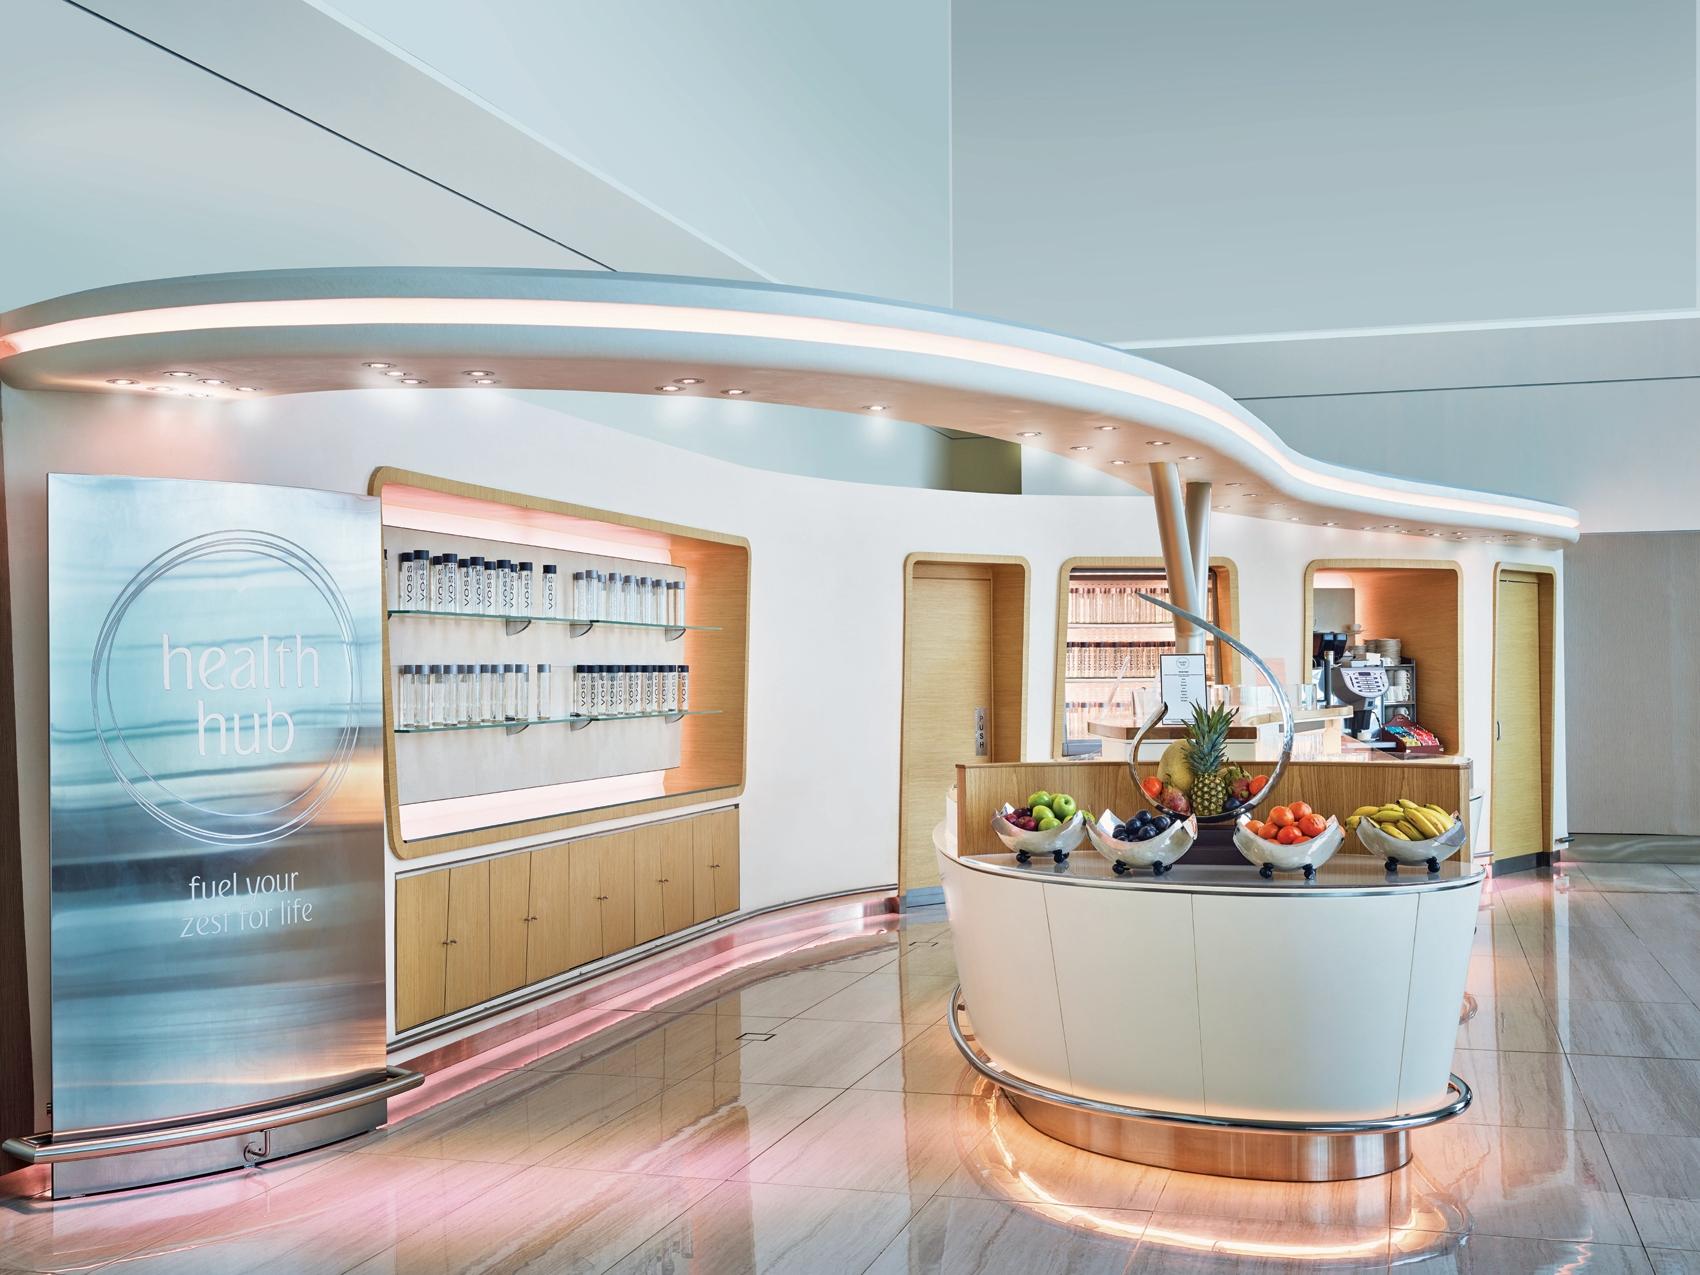 Emirates Business Class Lounge Health Hub Voss